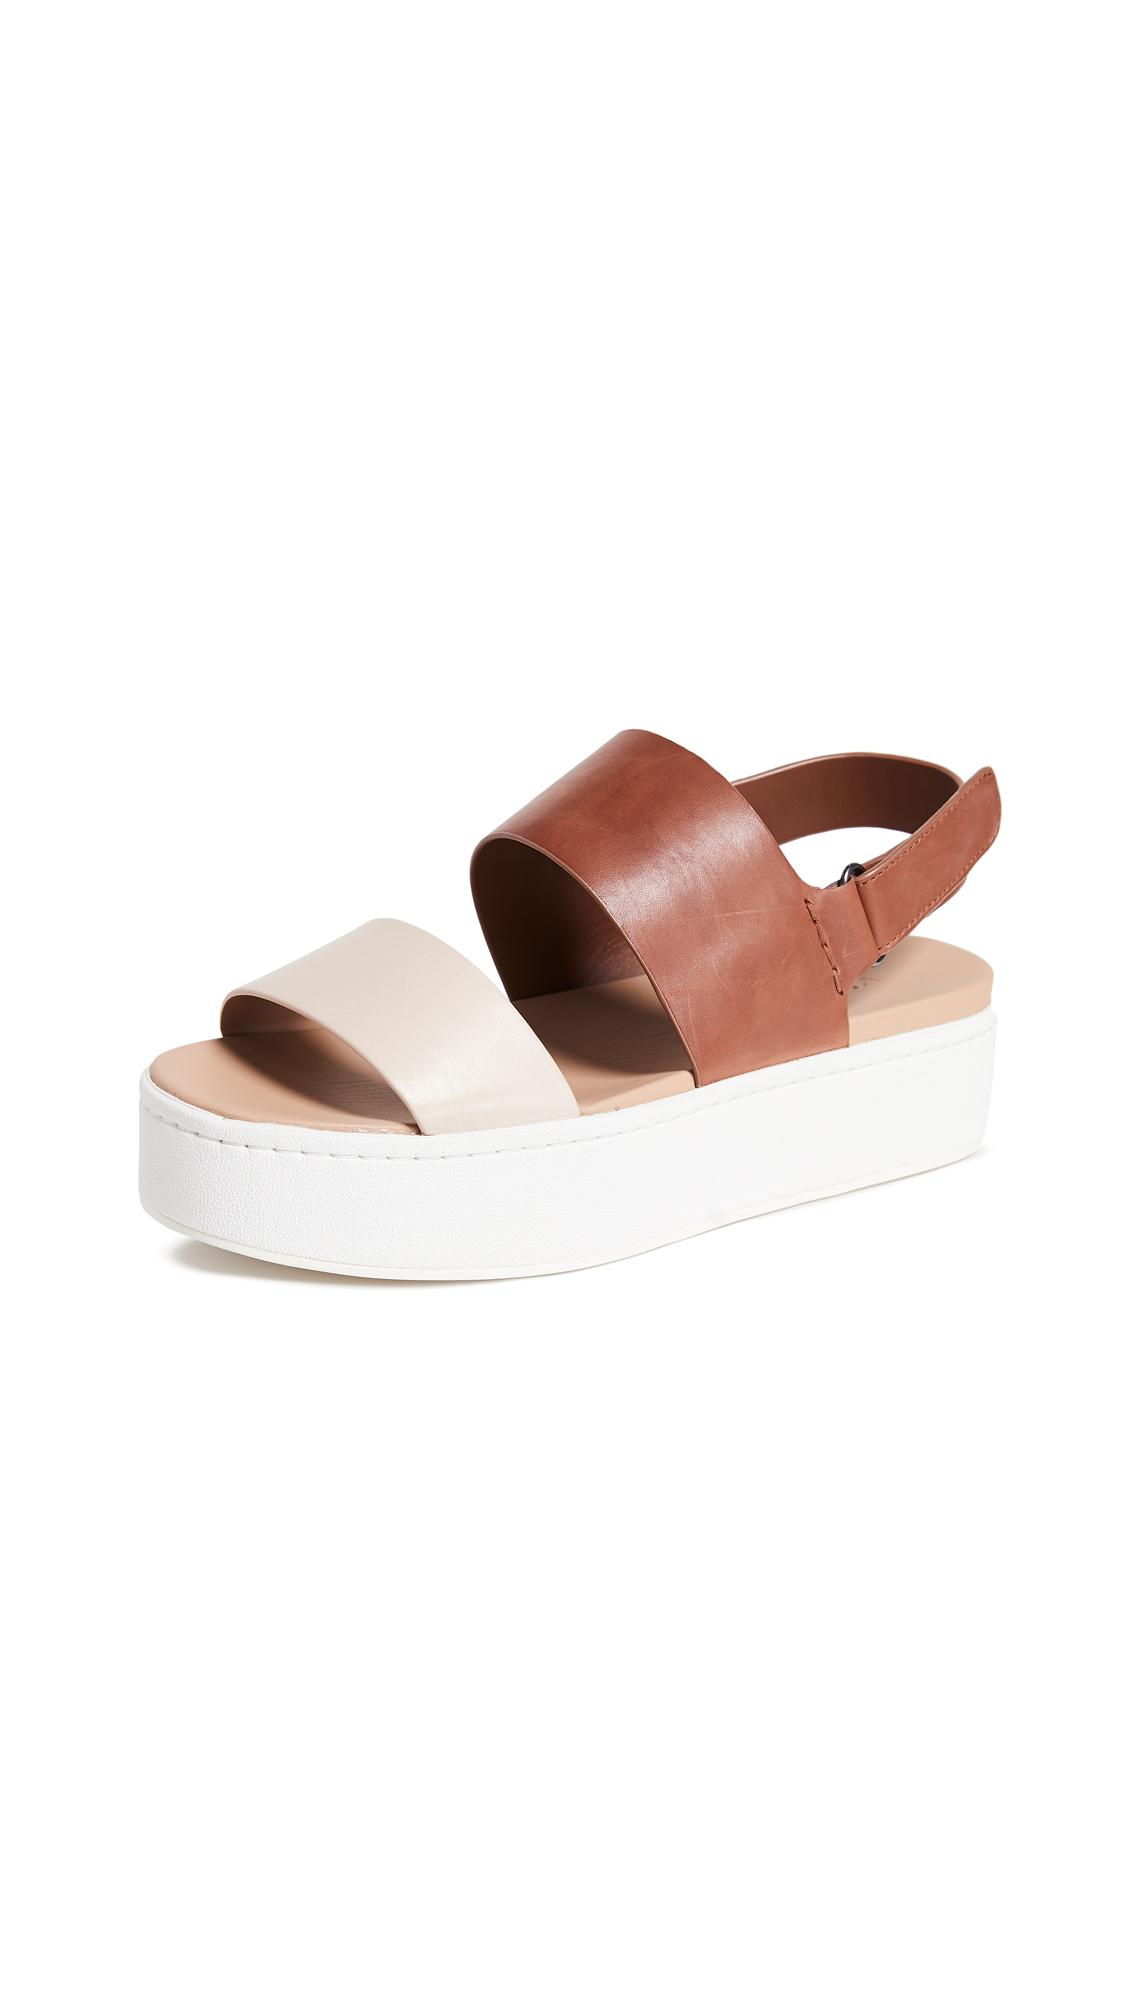 Vince Westport Platform Sandals - Putty/Russ